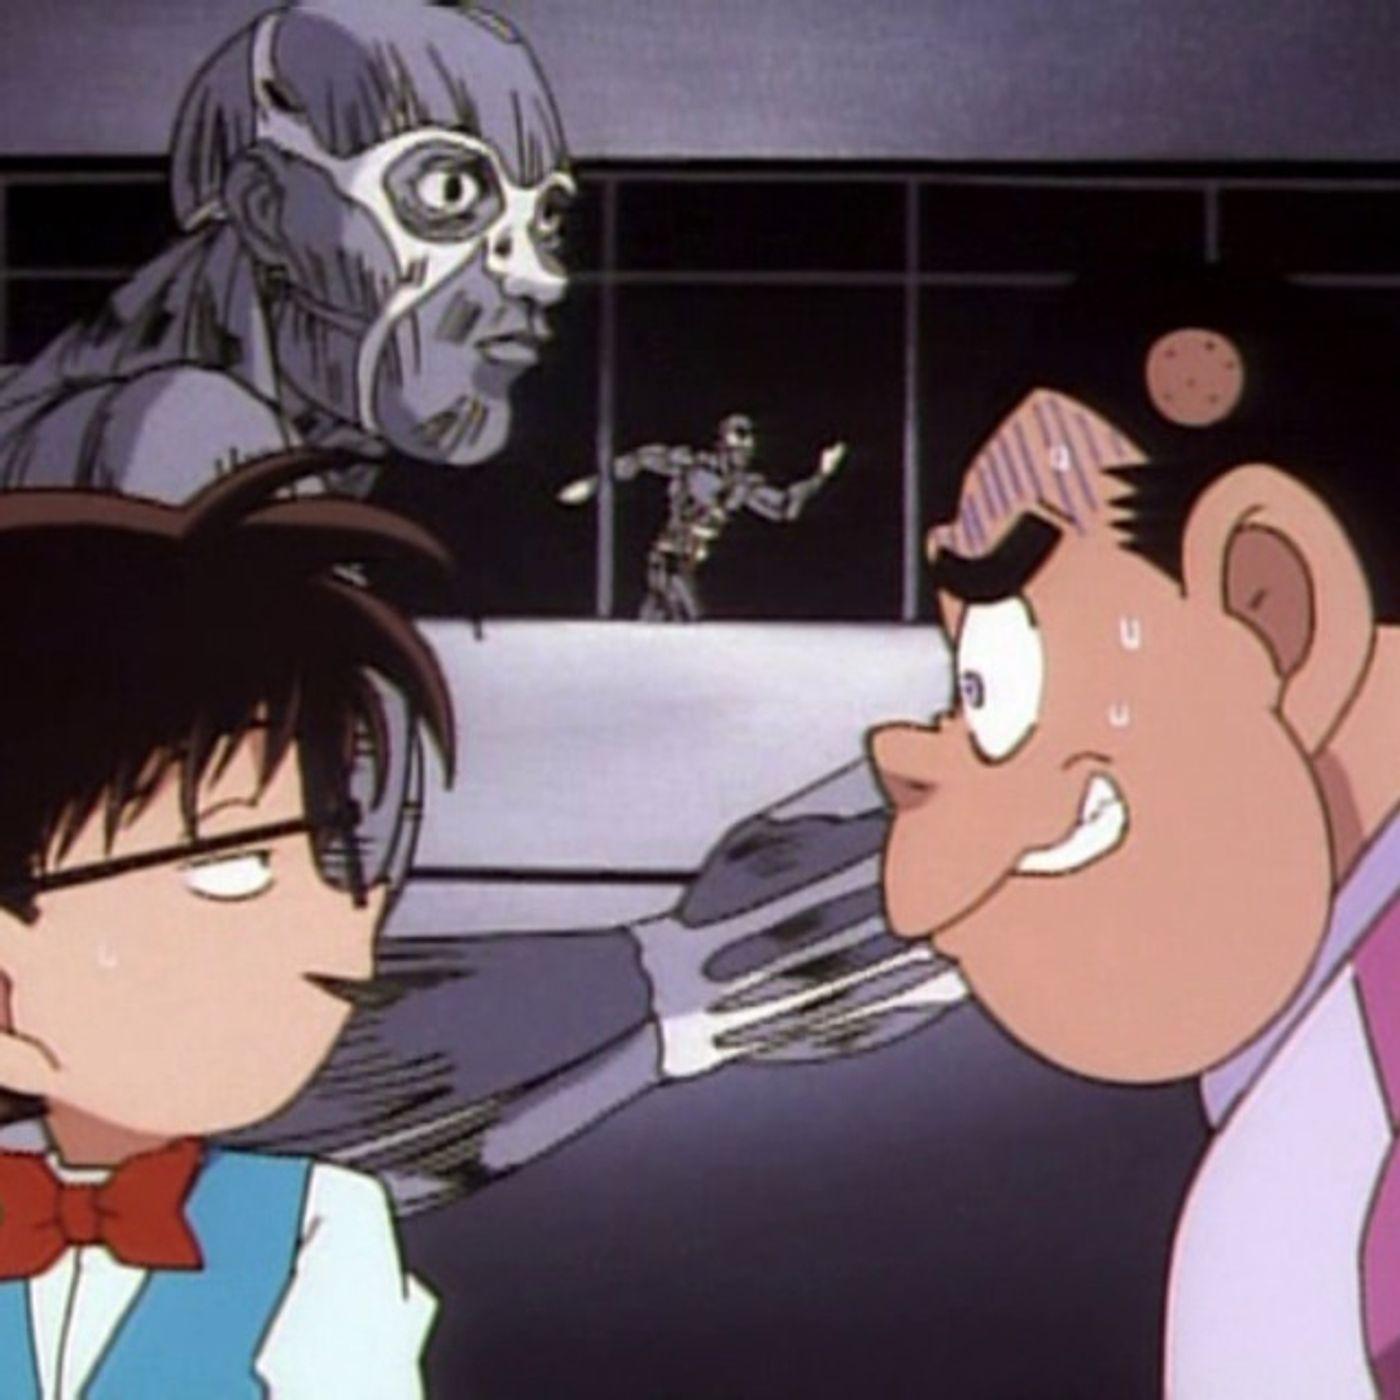 Detective Conan Episode 57 & 58: Hattori Returns!